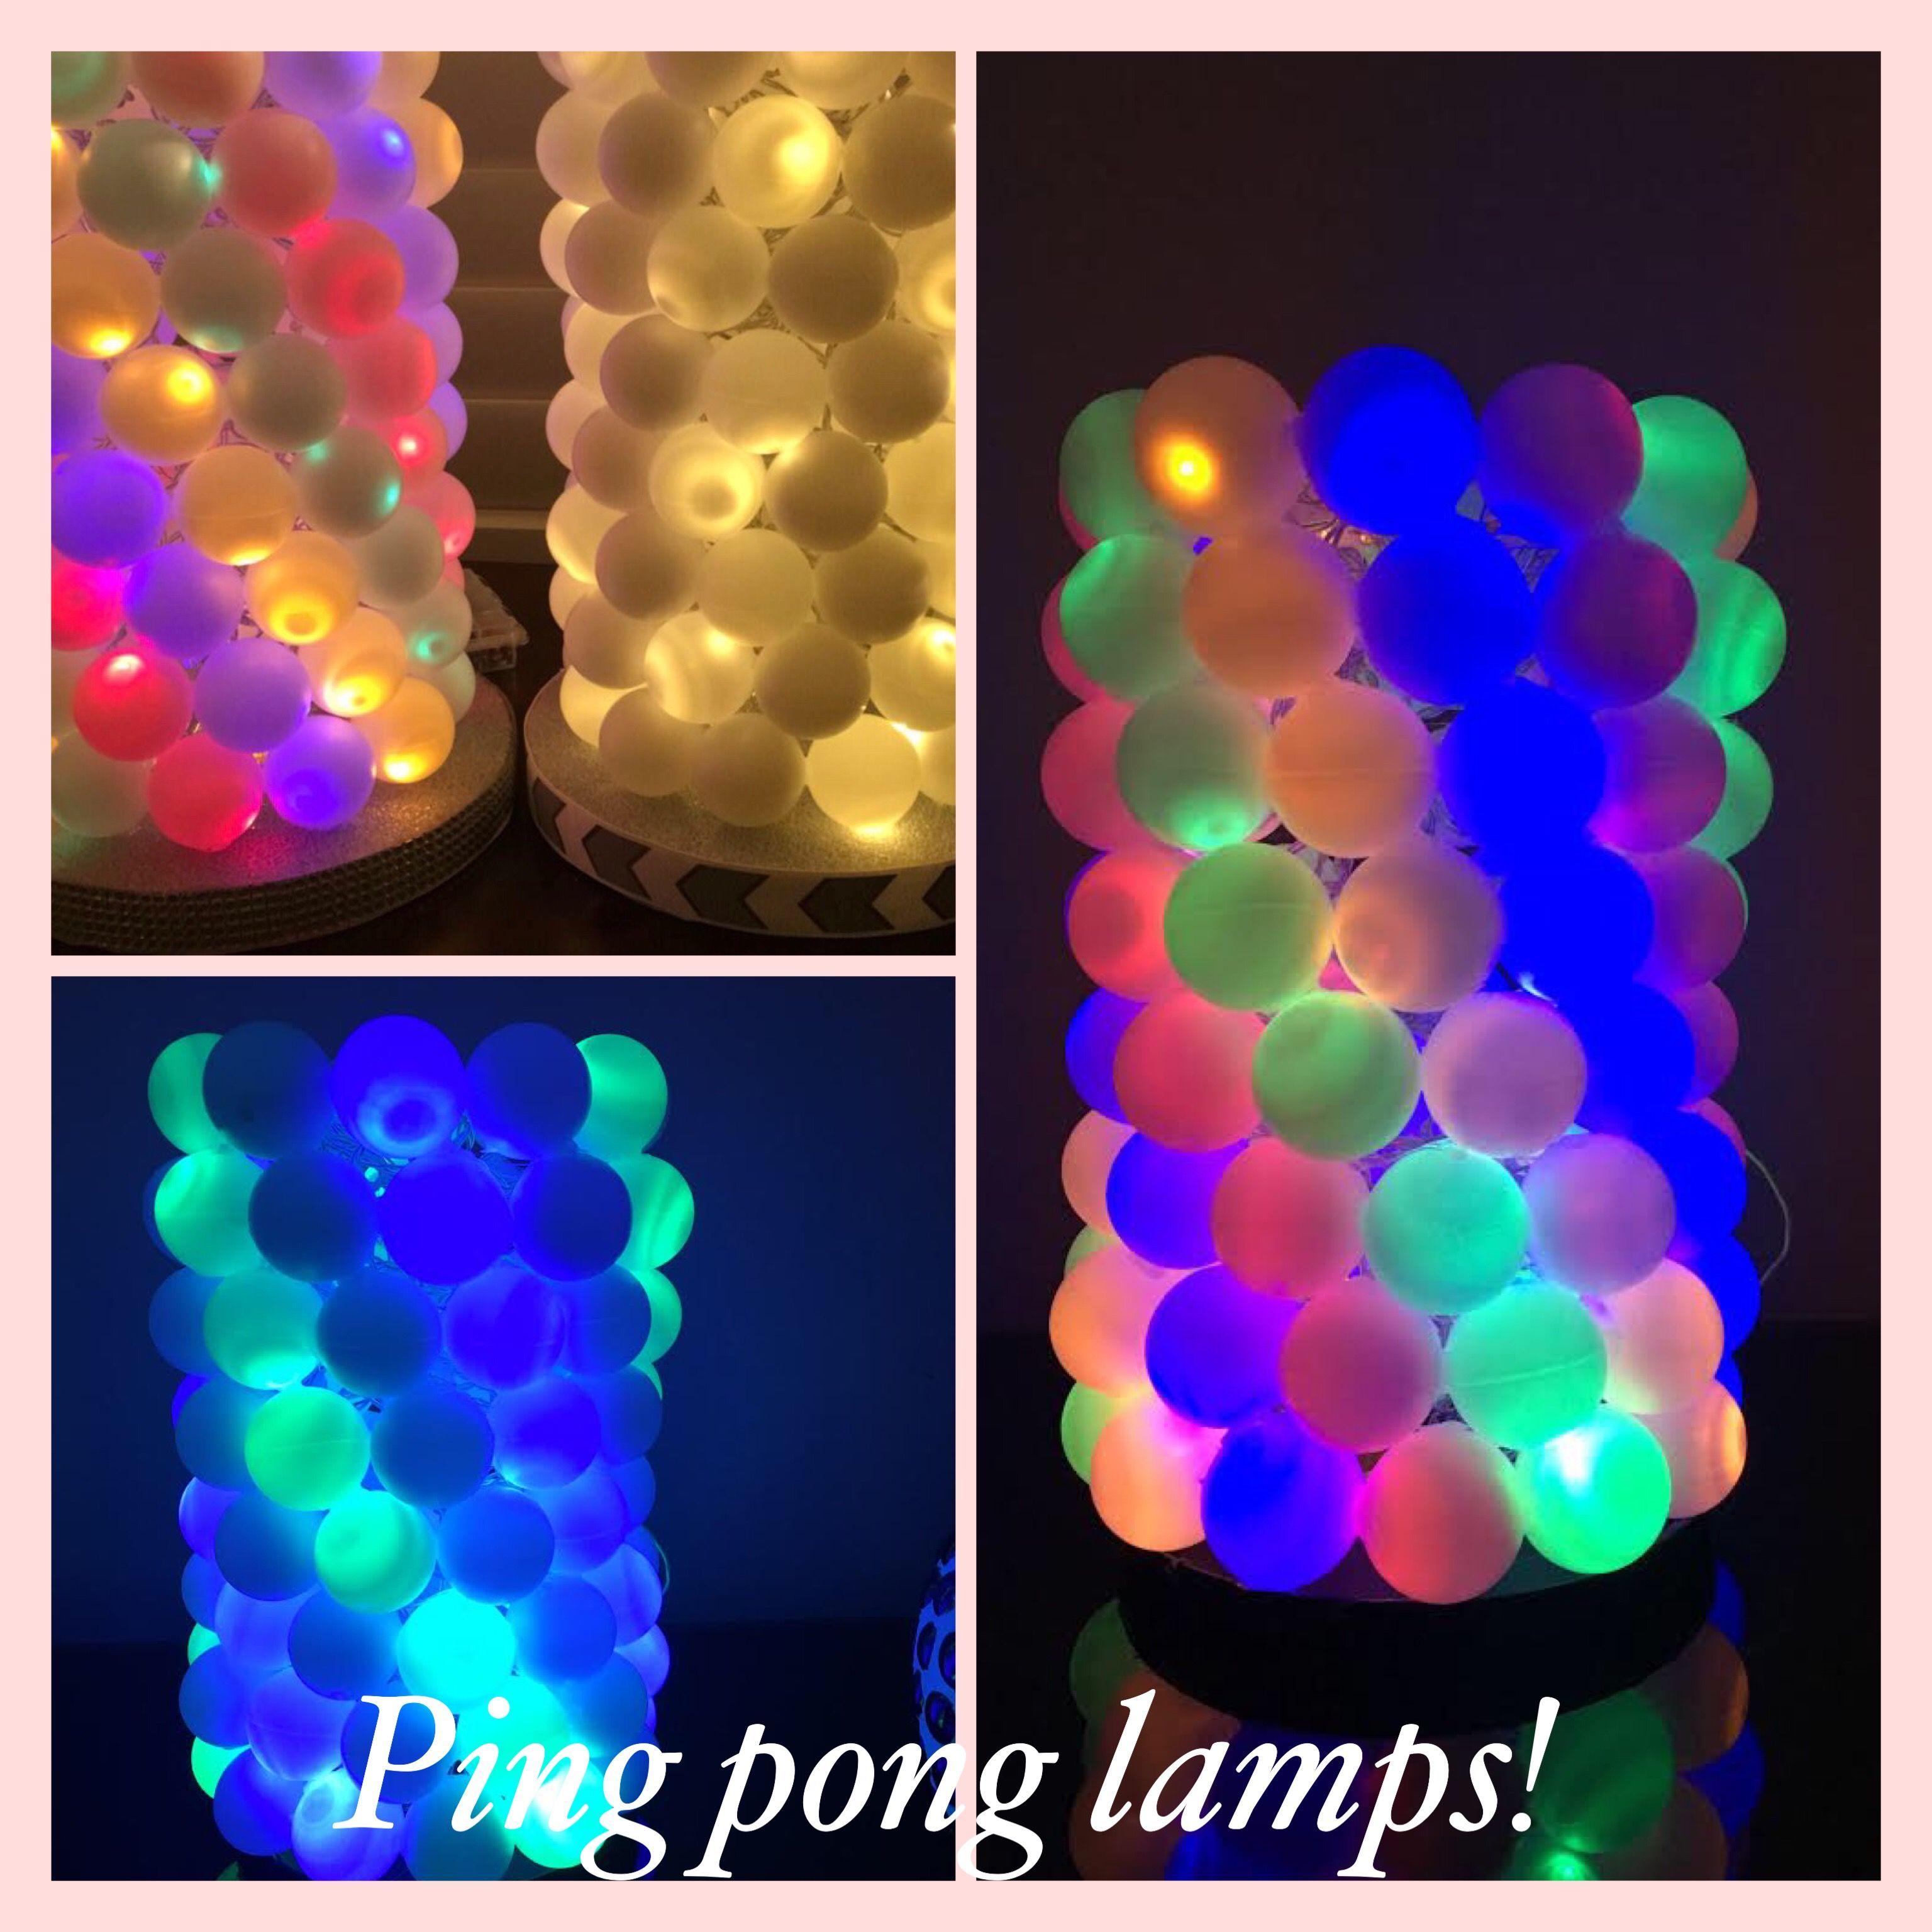 #Handmade #Lamp #Led #Lights #Pingpong #Craft #Ideas #Diy